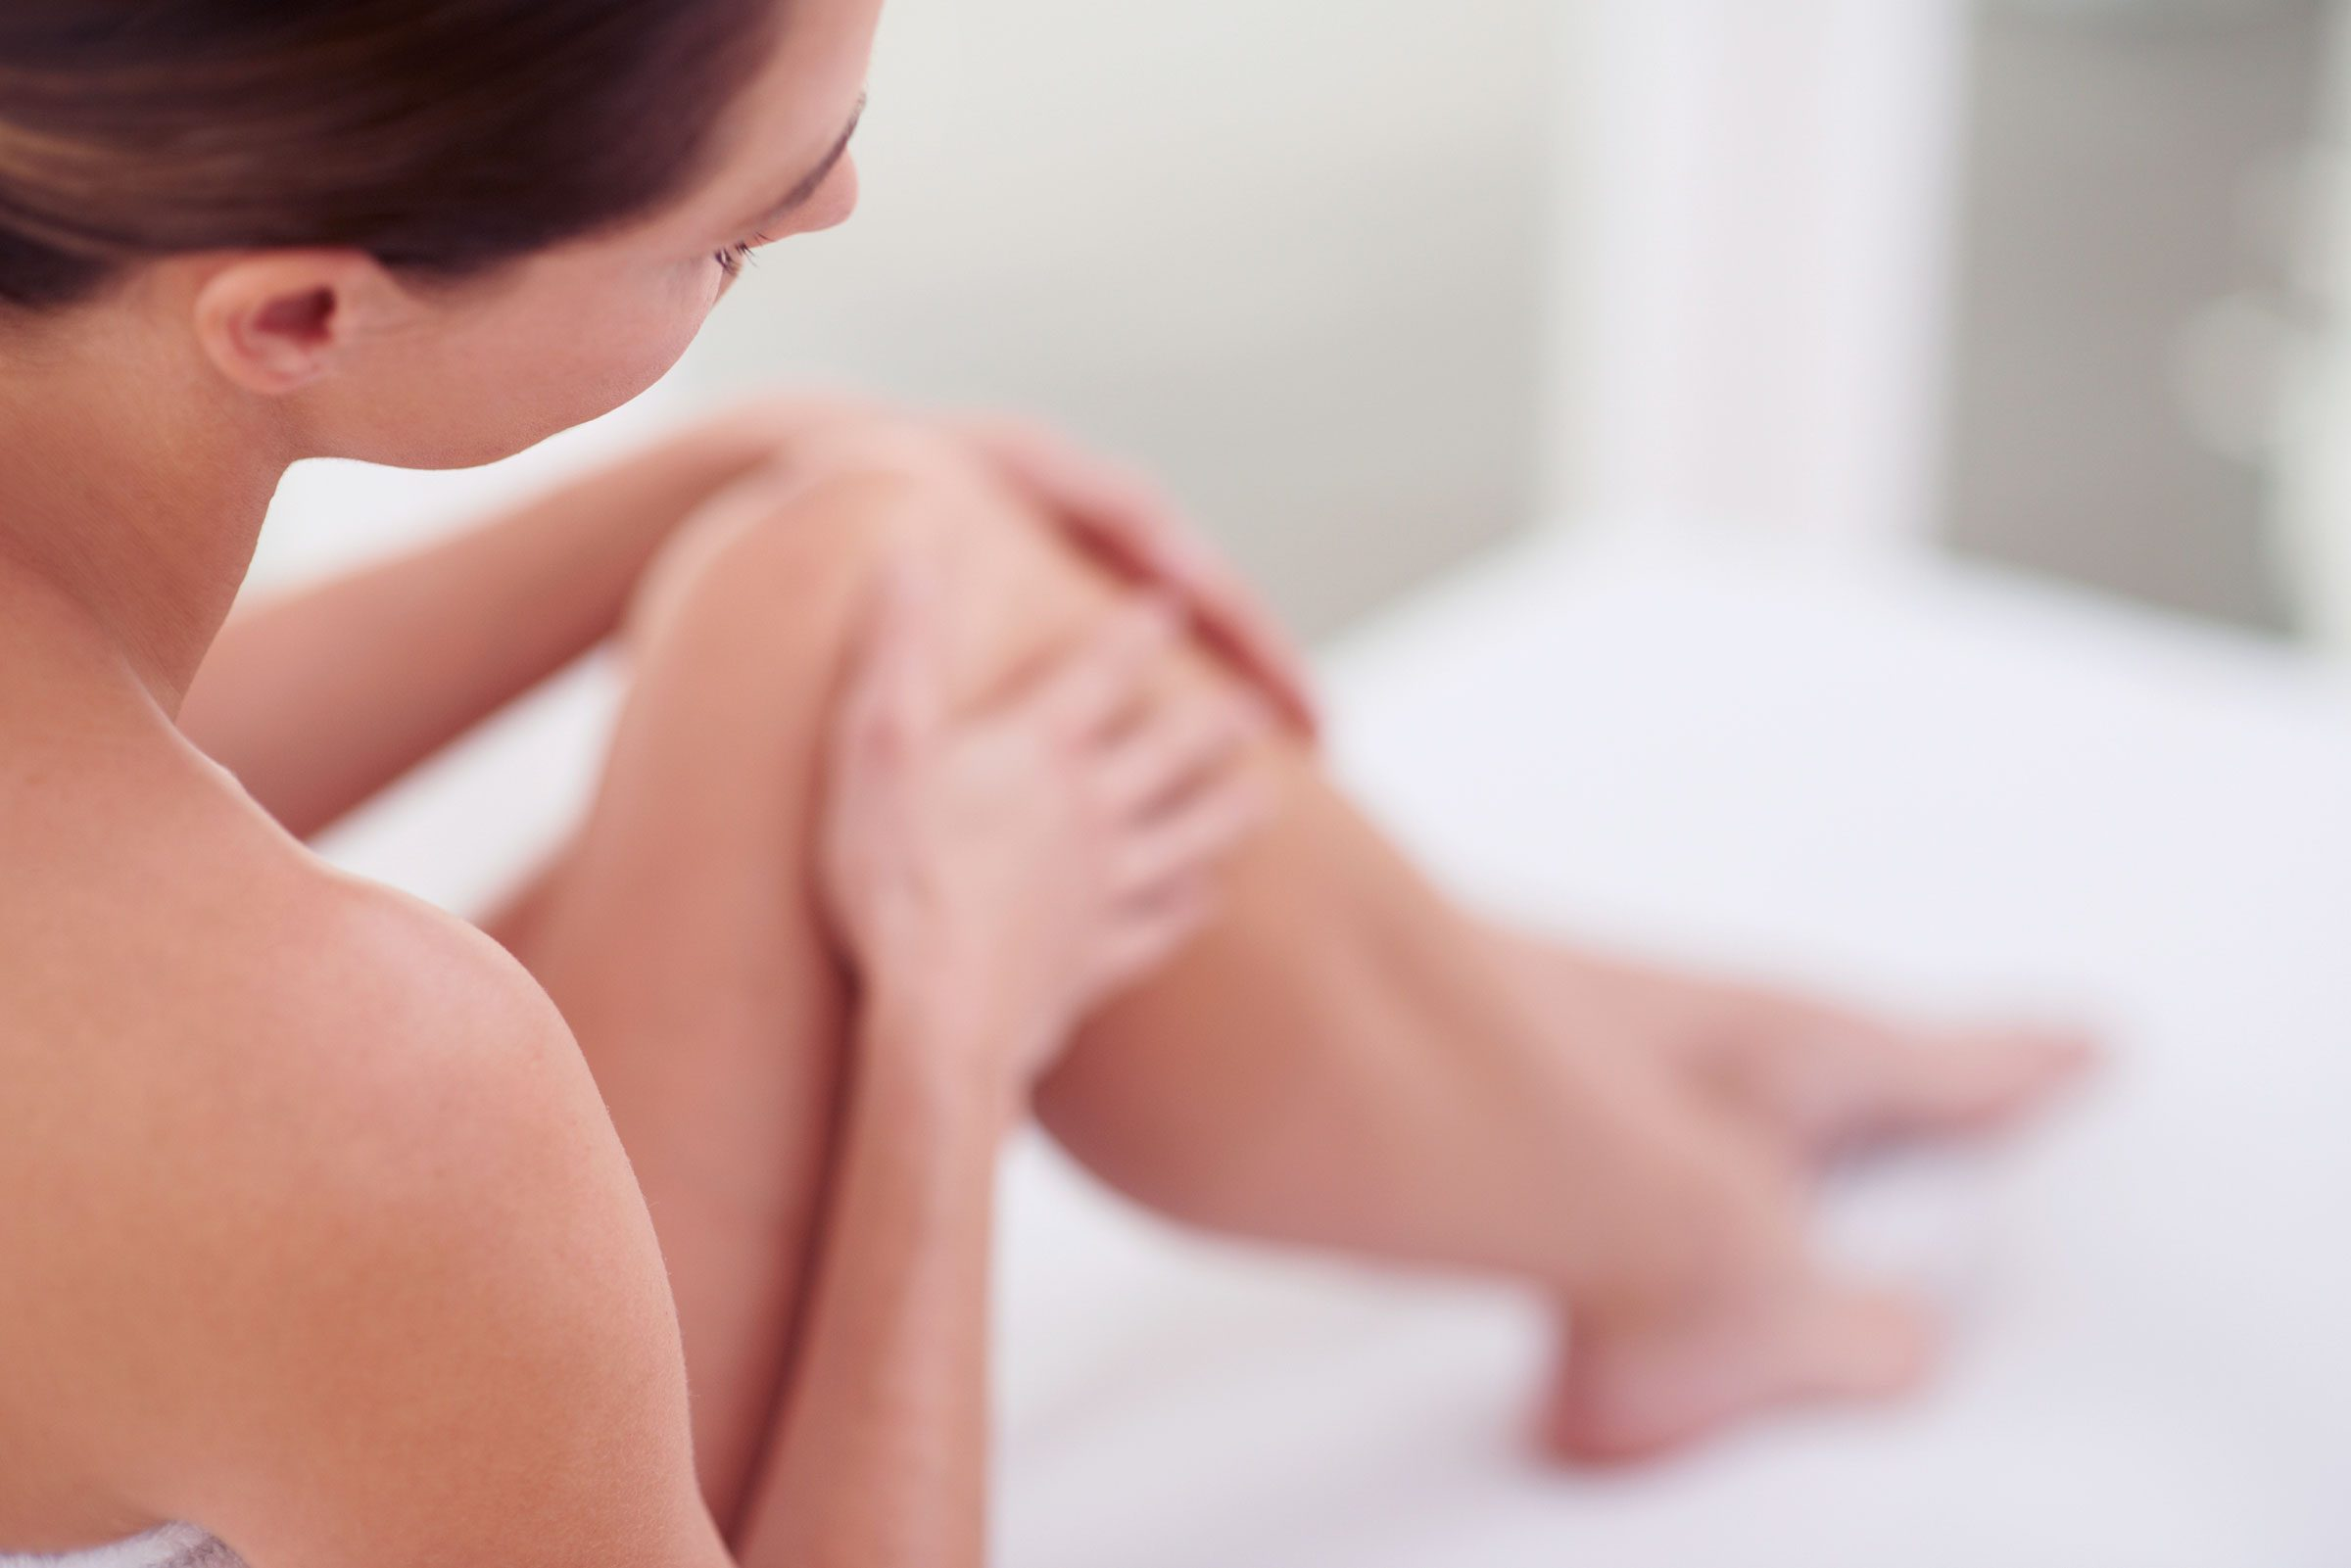 garlic benefits 13 health beauty amp home uses reader s